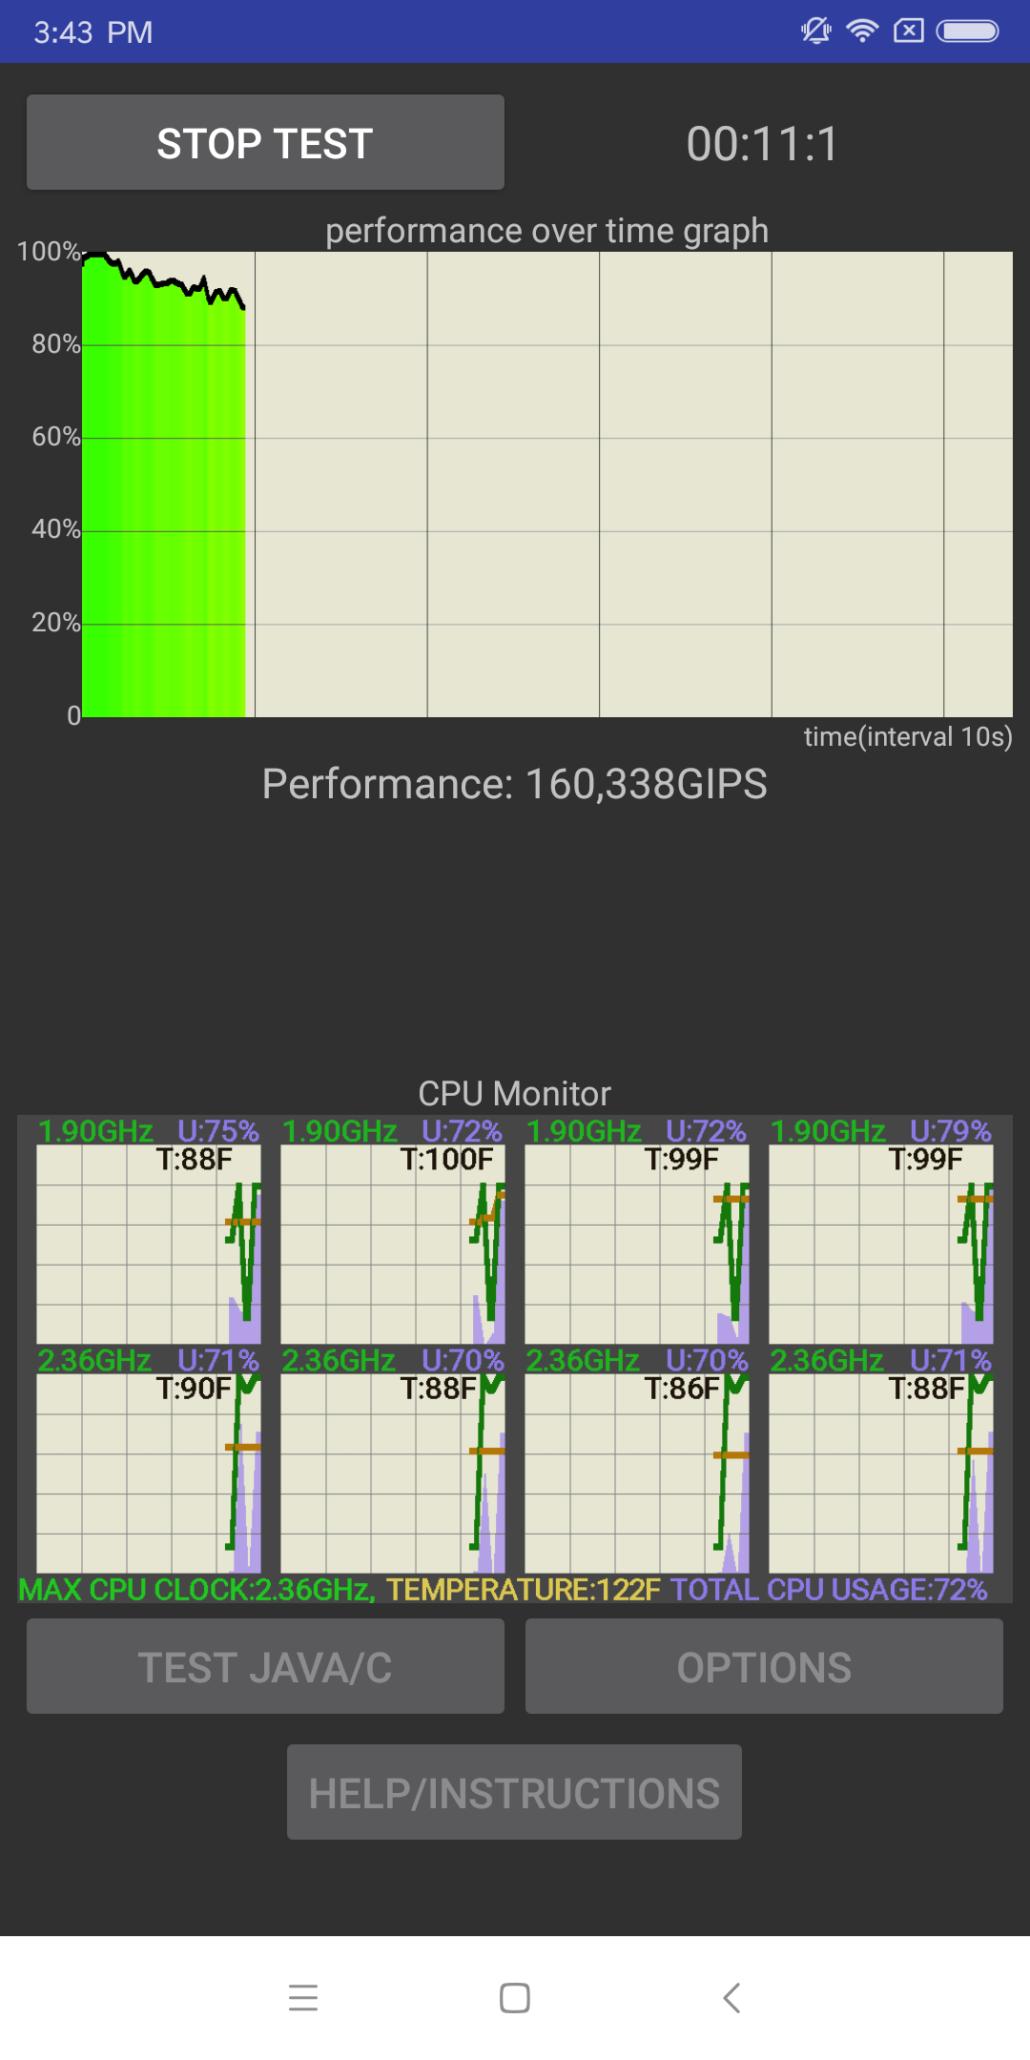 screenshot_2018-01-29-15-43-31-977_skynet-cputhrottlingtest